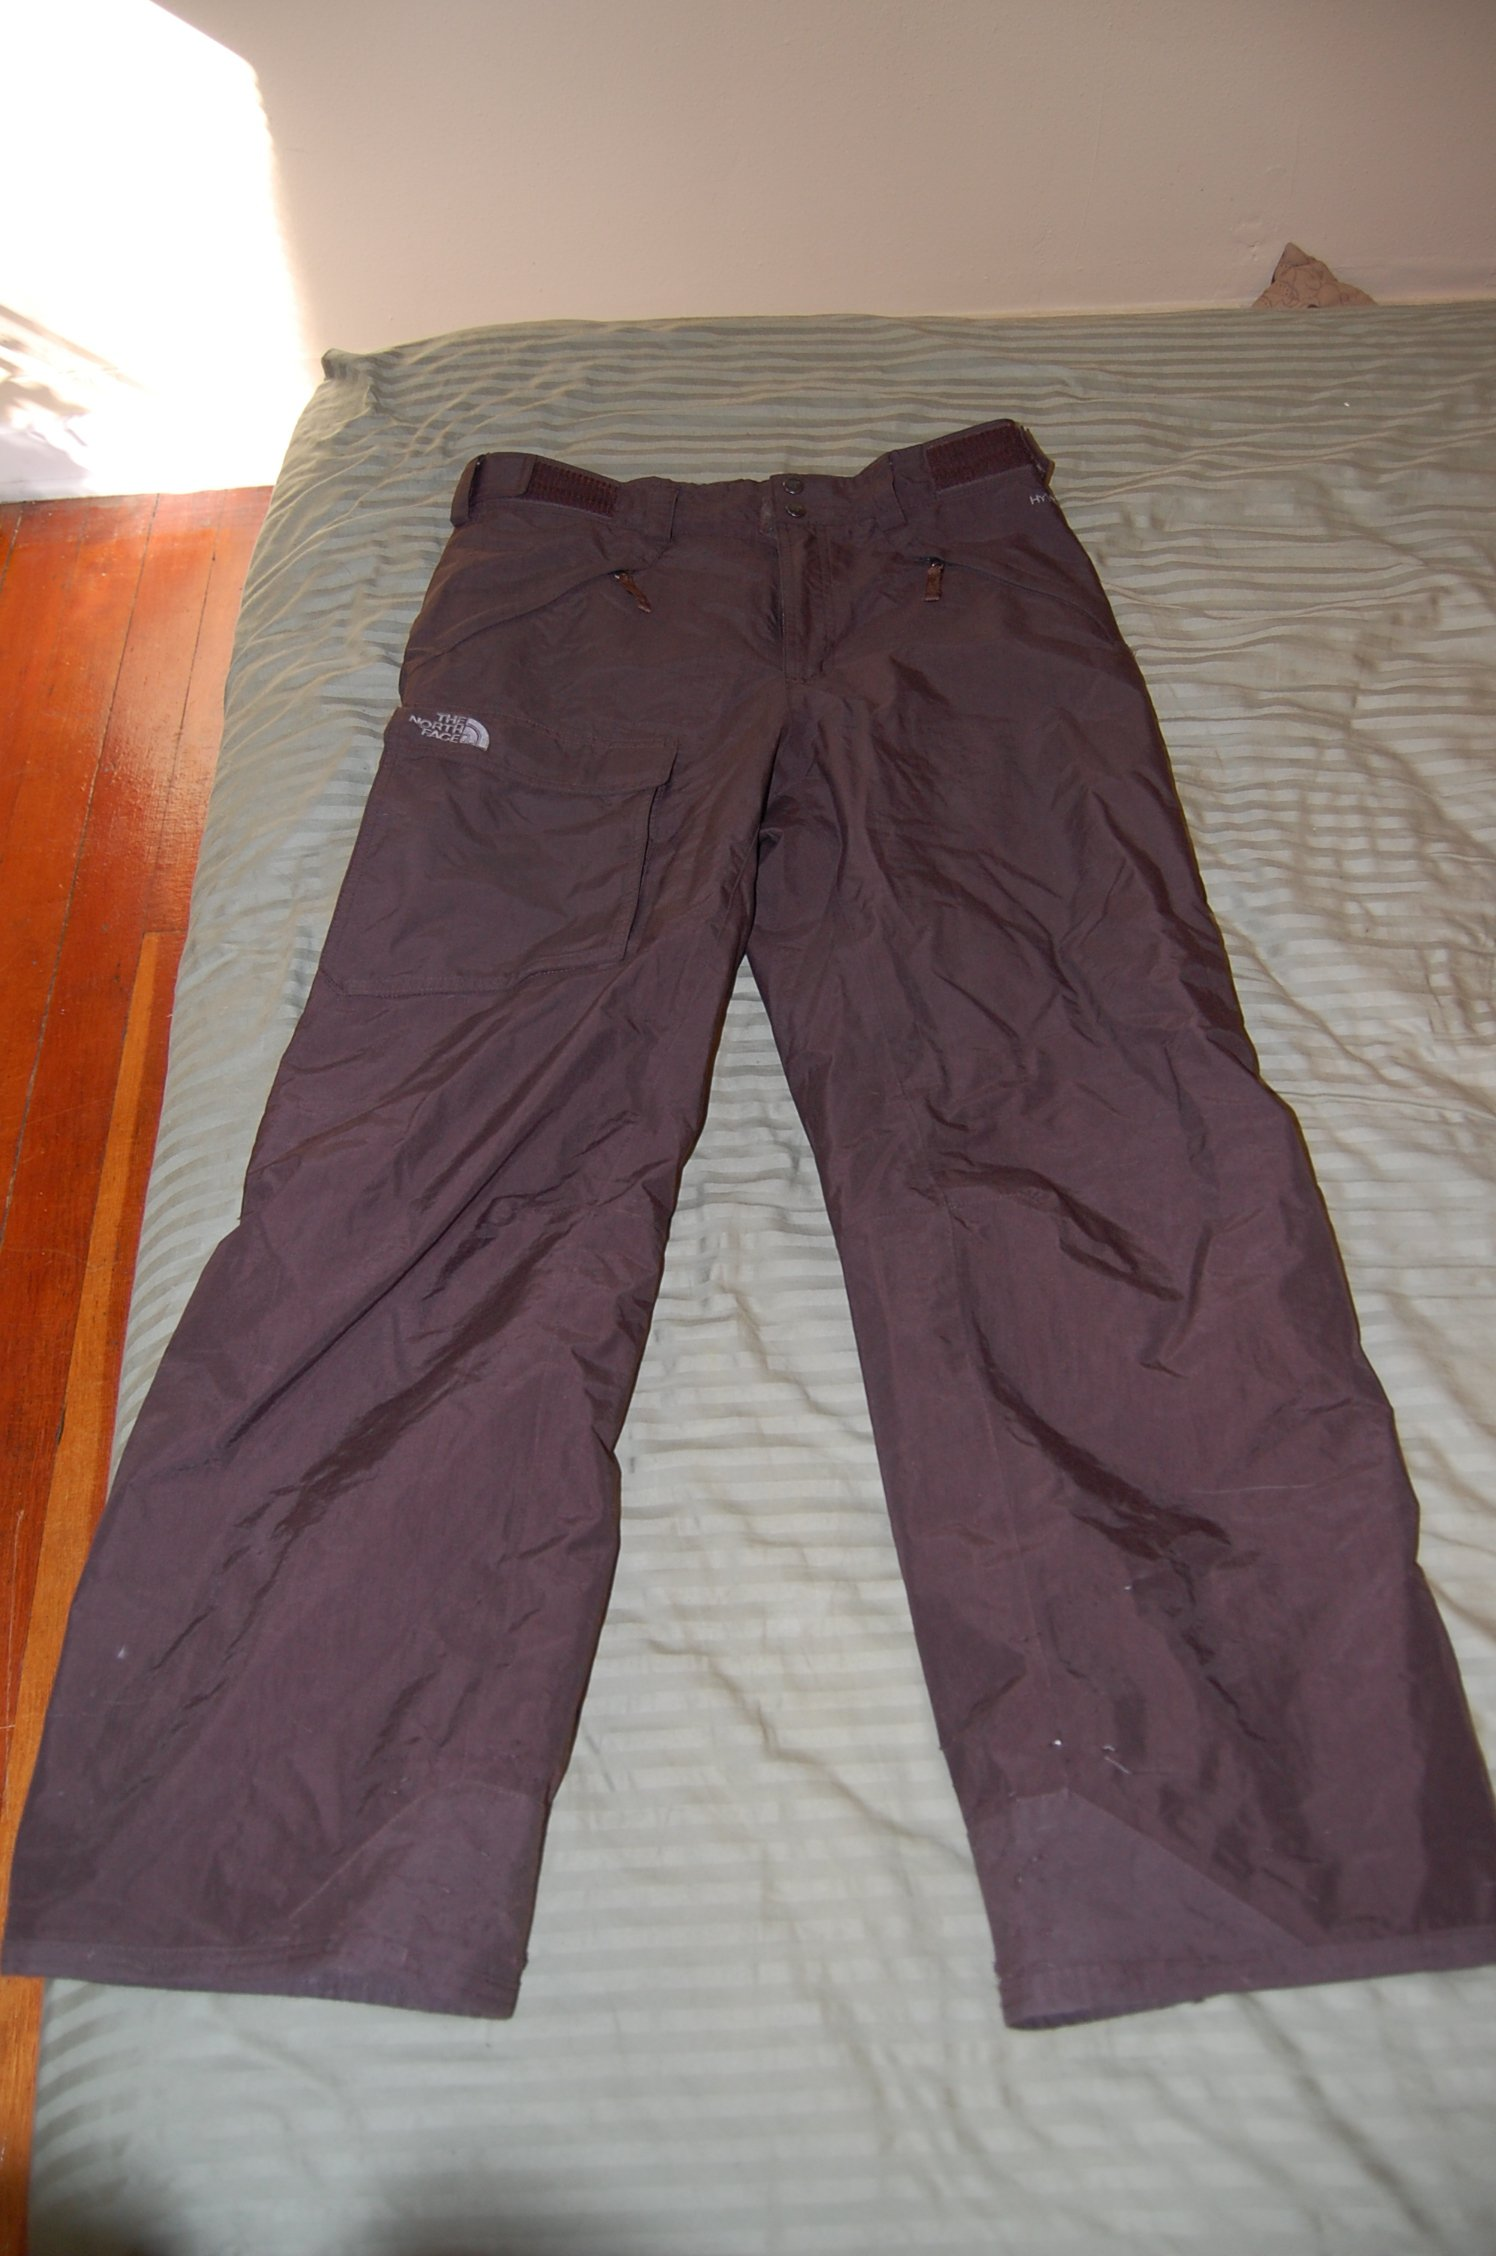 NF pants